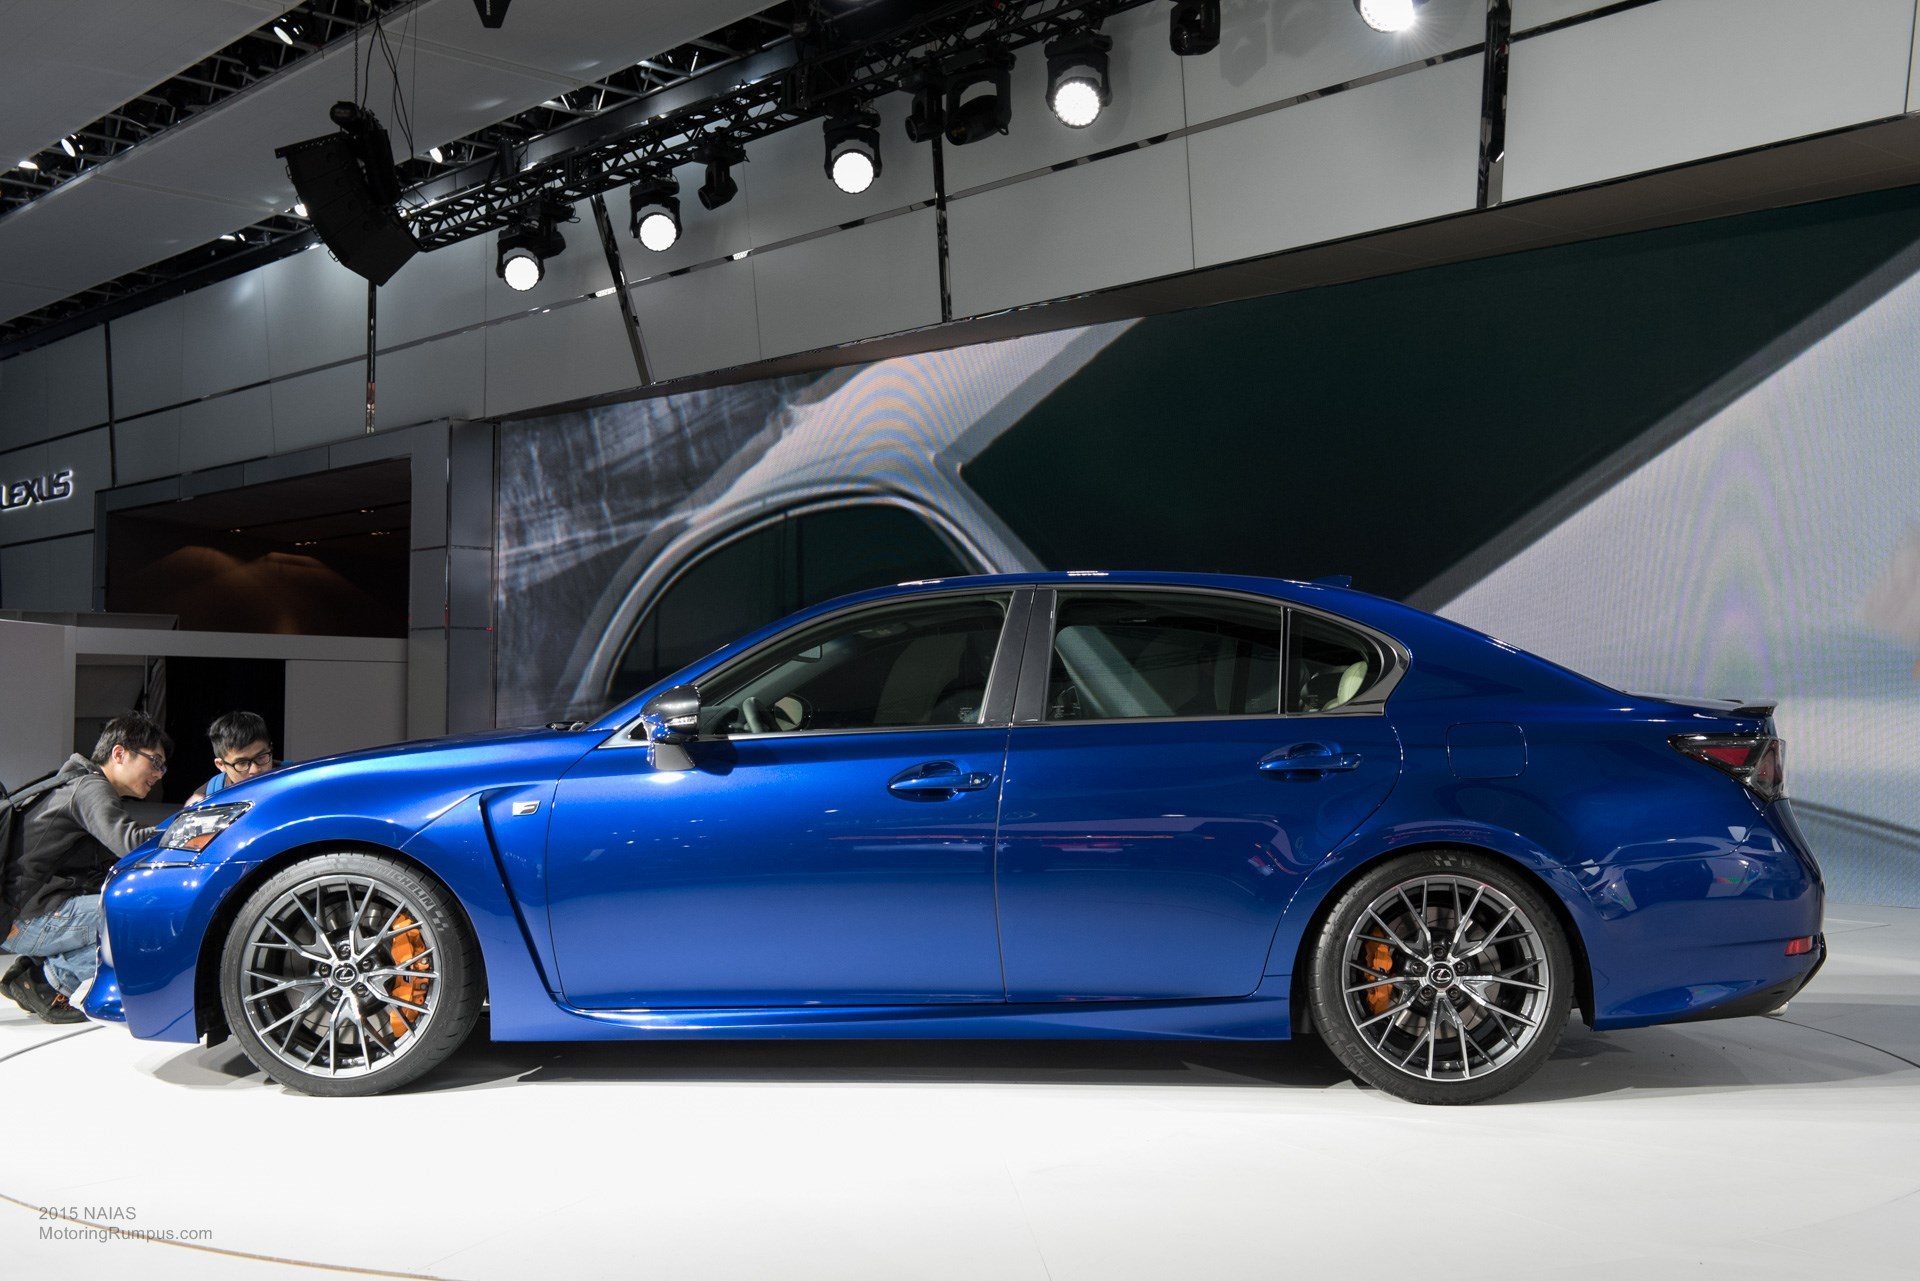 2015 NAIAS Lexus GS F Debut